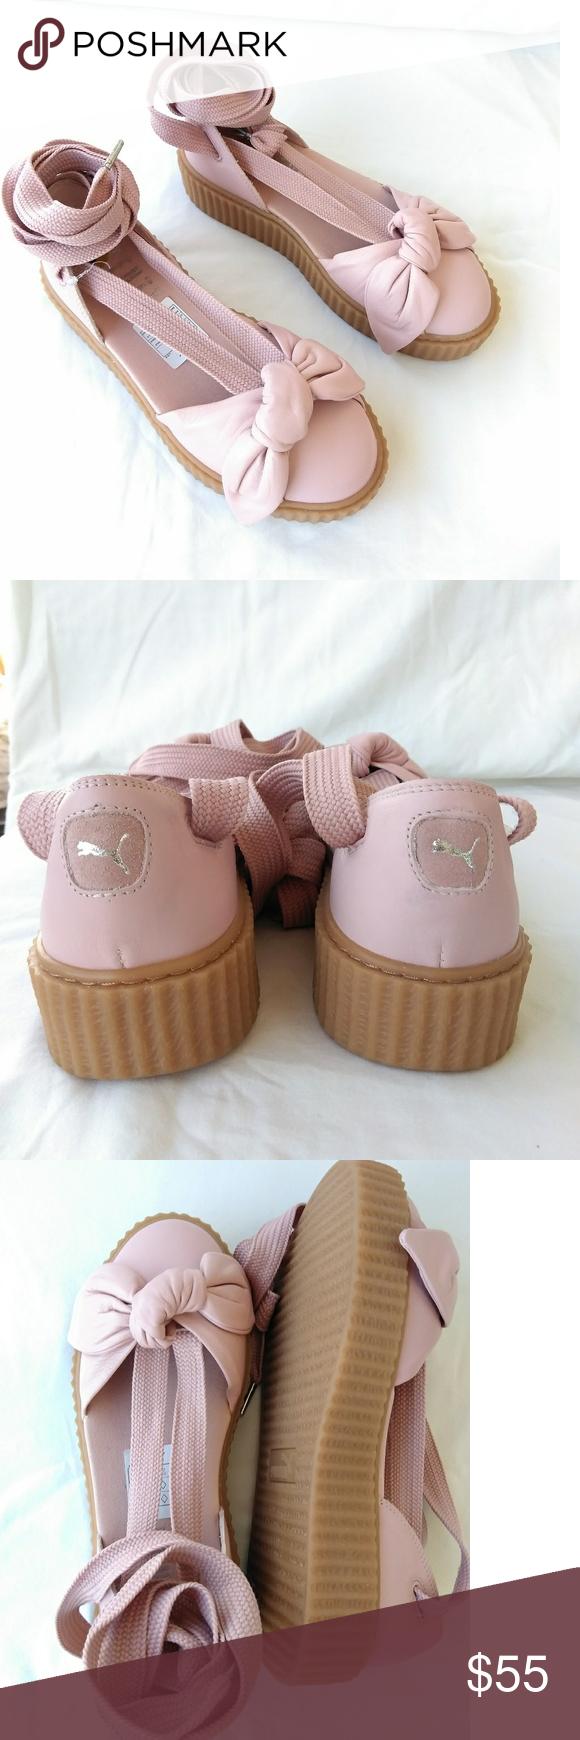 d298eecc390 Fenty PUMA by Rihanna bow creeper sandals Brand new blush pink sandals.  Size 8 Puma